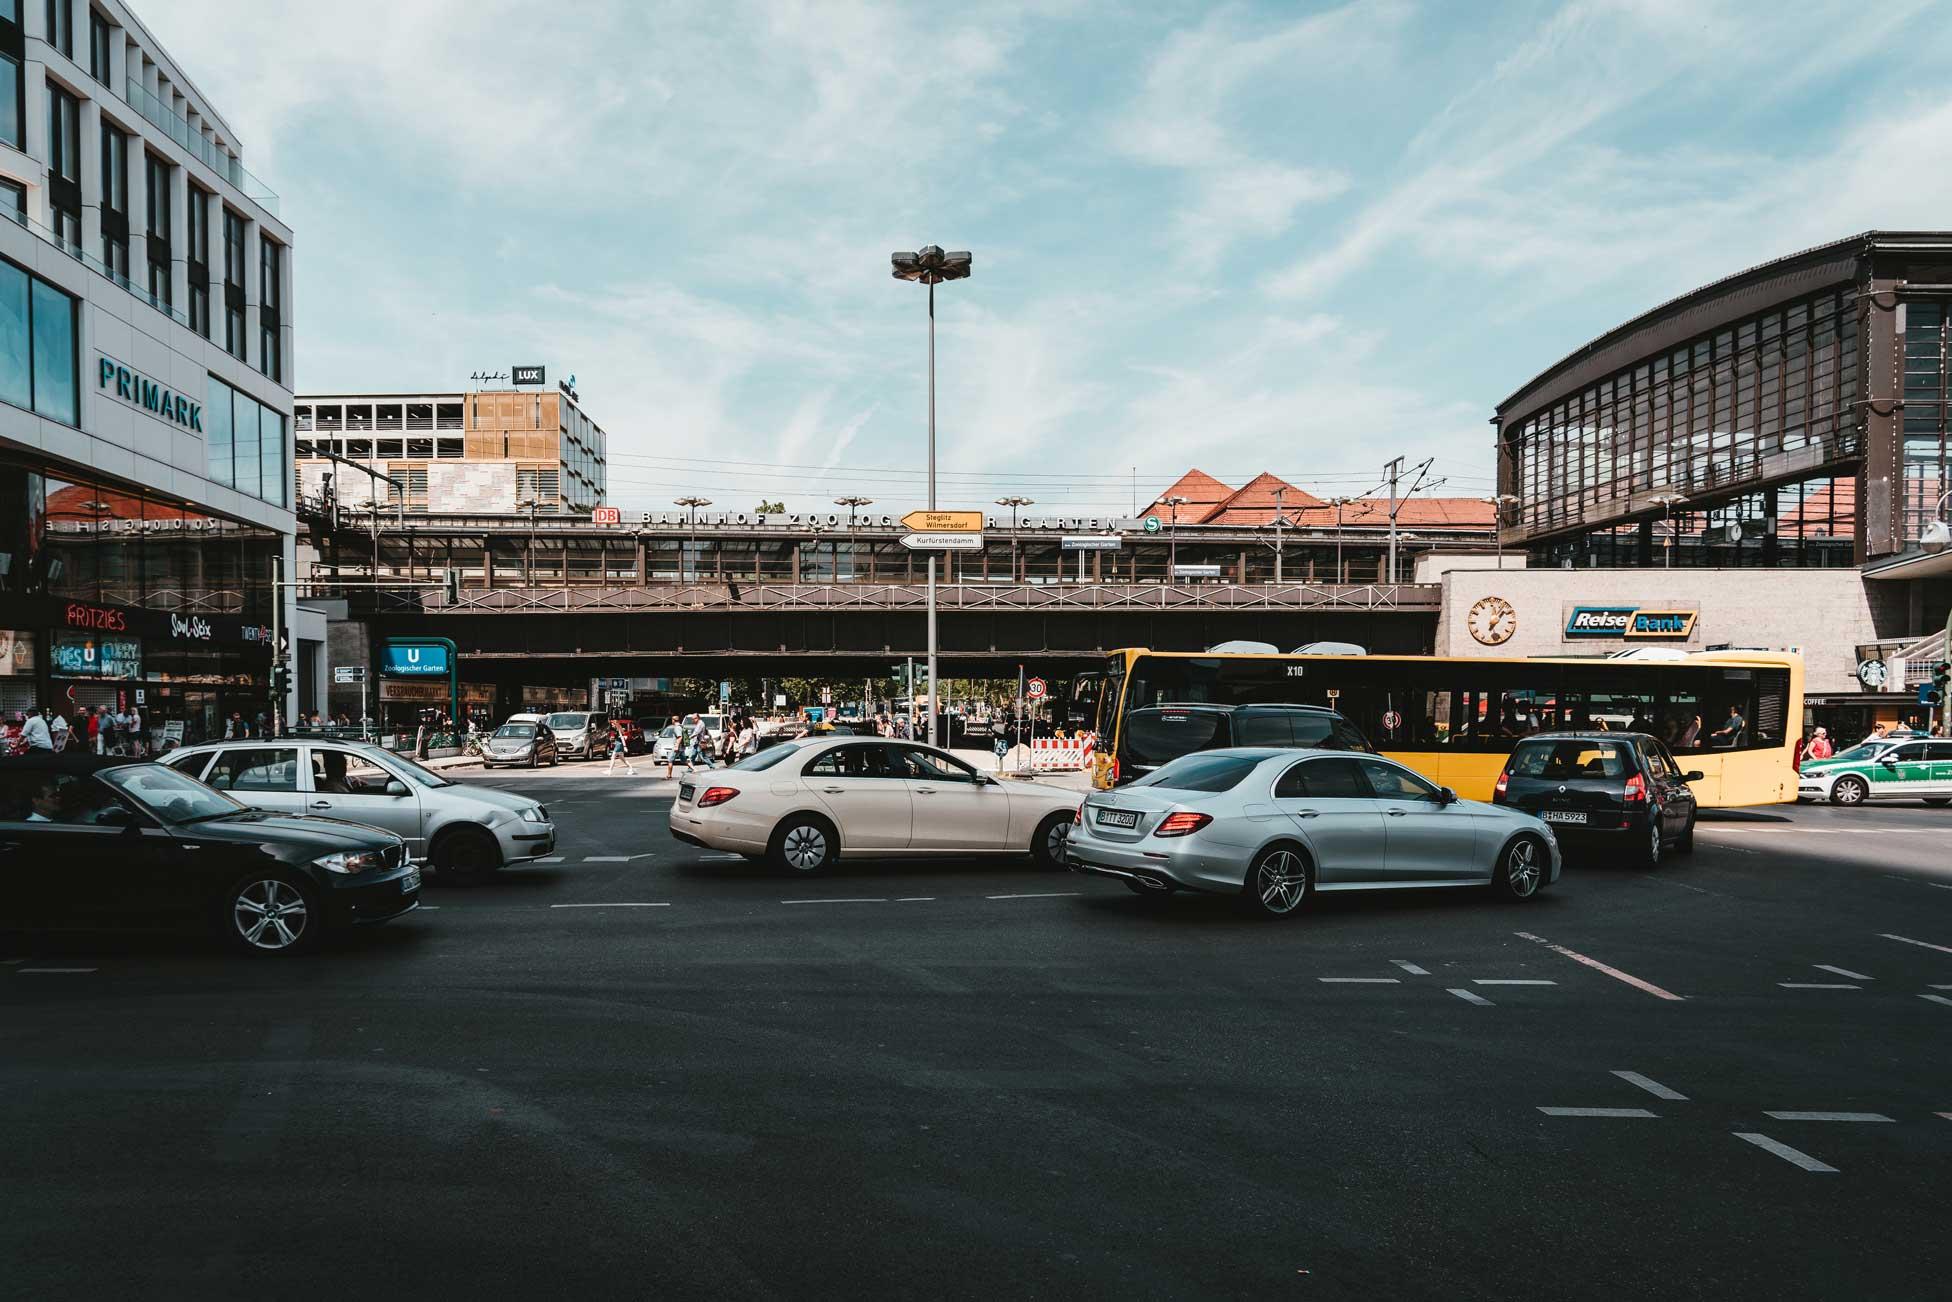 Bild: Bahnhof-Zoo-Berlin